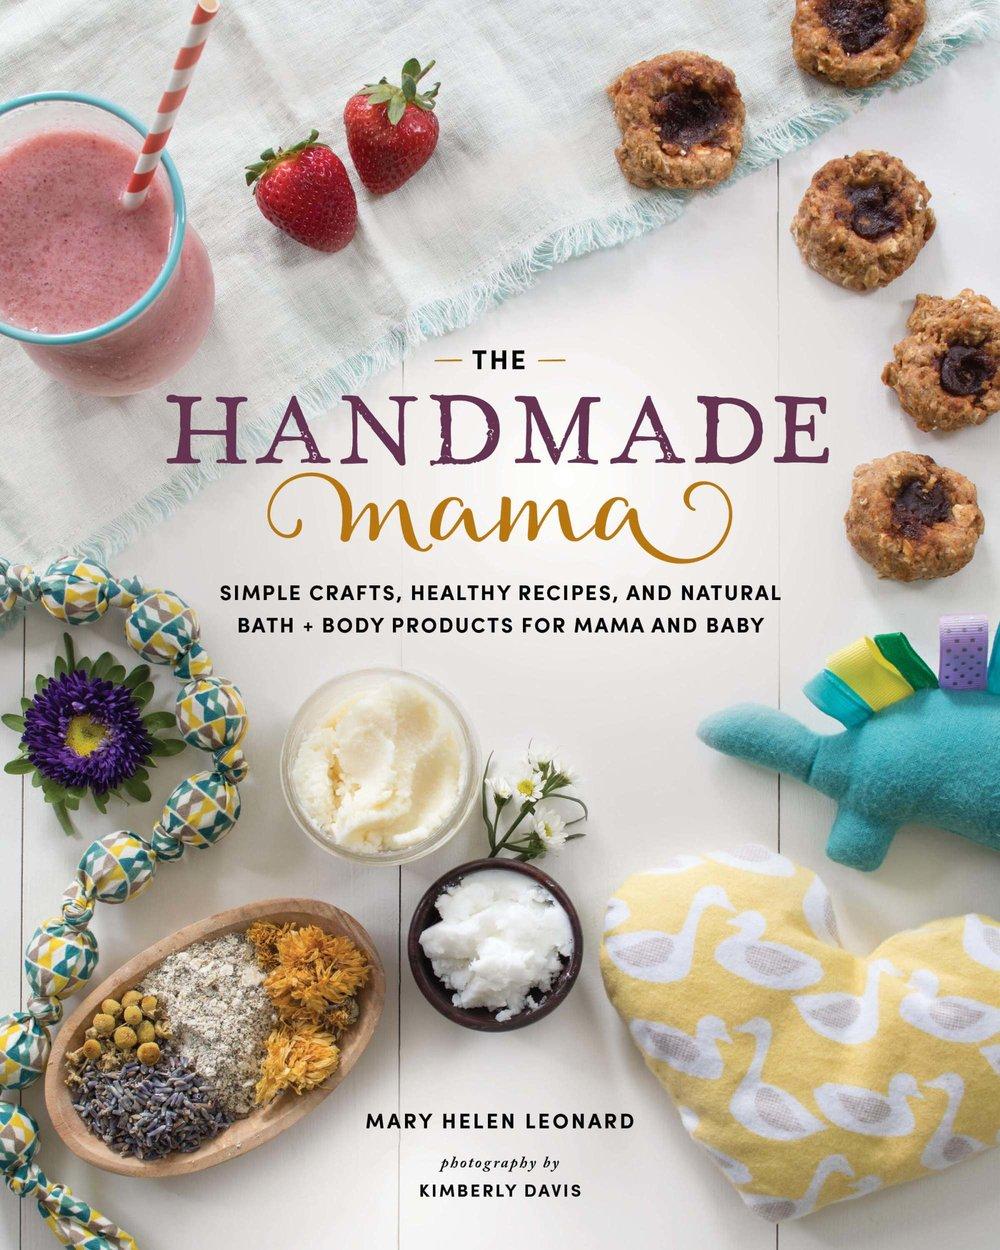 The Handmade Mama - Styling by Mary Helen Leonard   Photography by Kimberly Davis   Spring House Press 2018